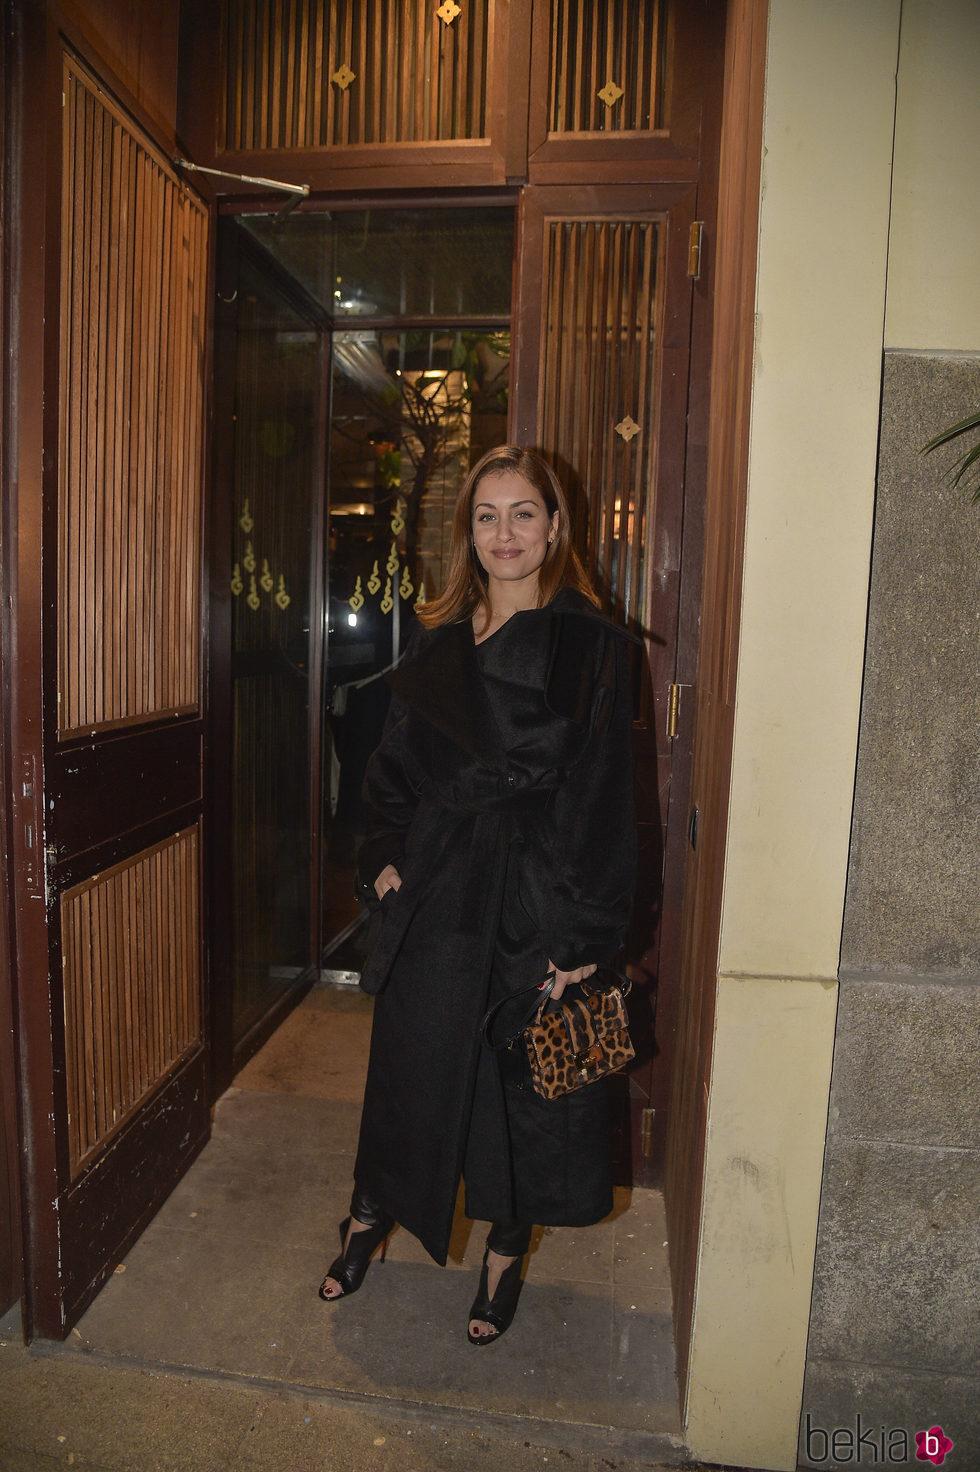 Hiba Abouk en el 63 cumpleaños de Bibiana Fernández